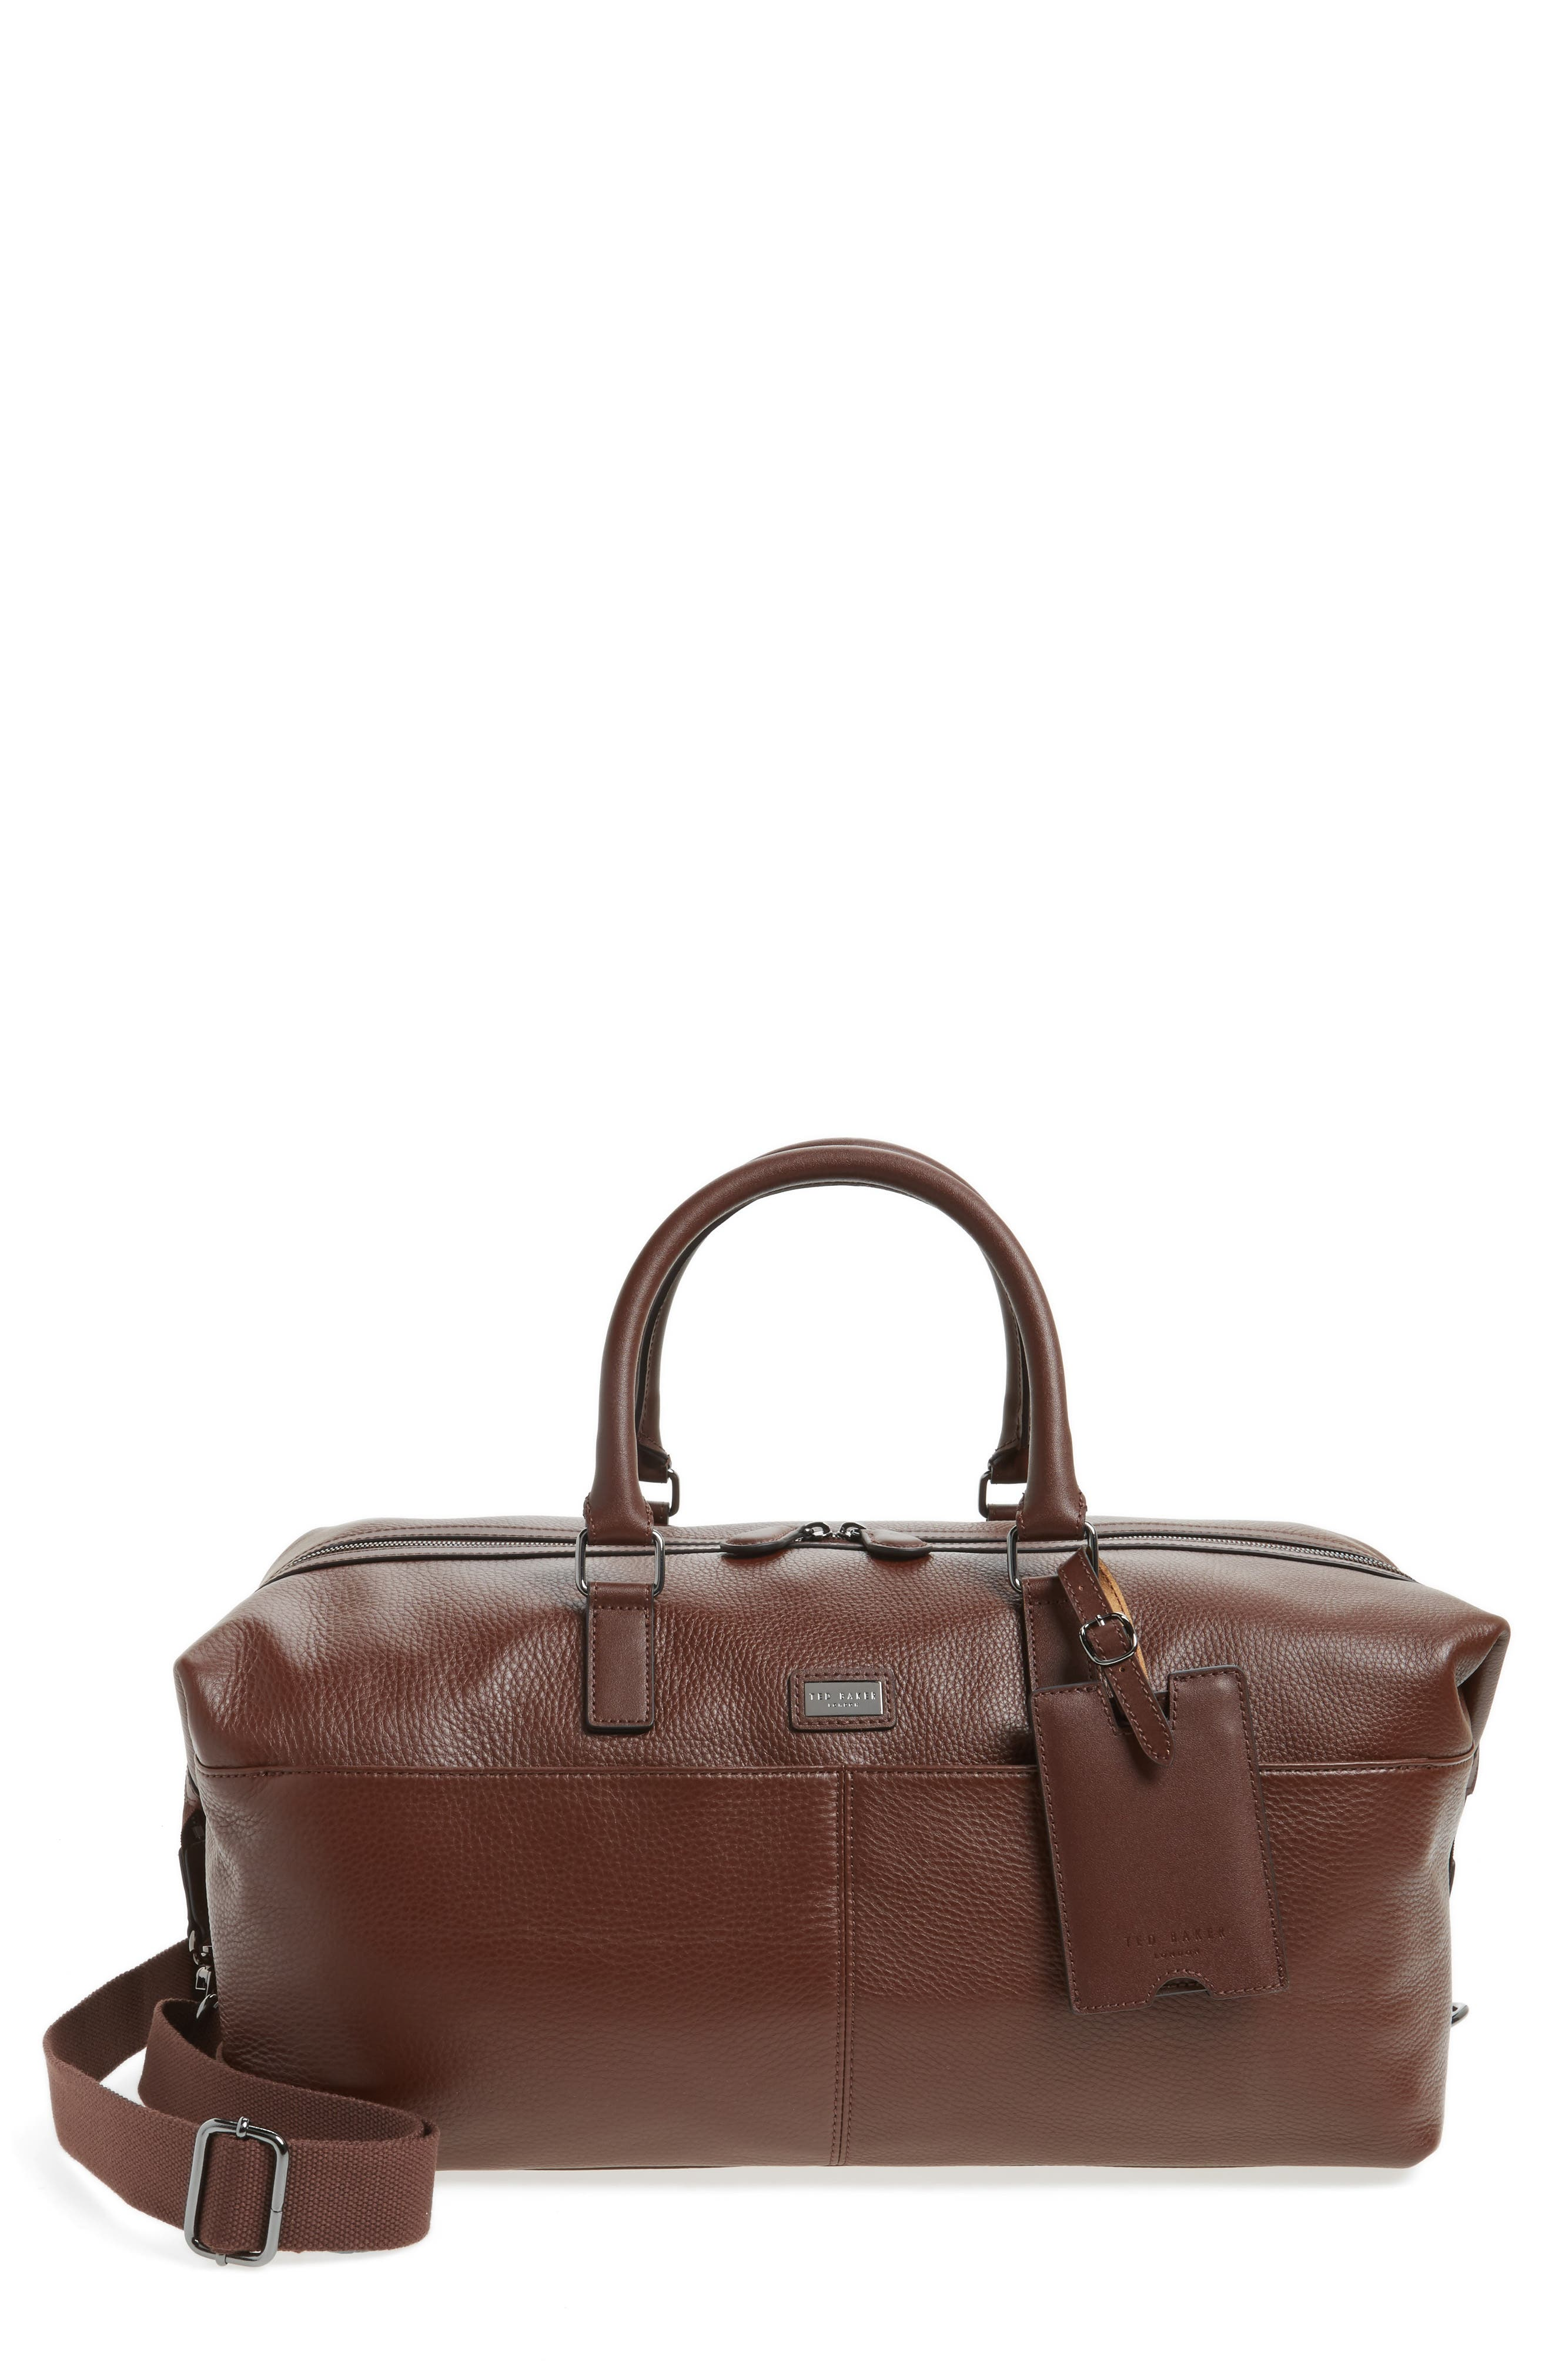 Main Image - Ted Baker London Leather Duffel Bag